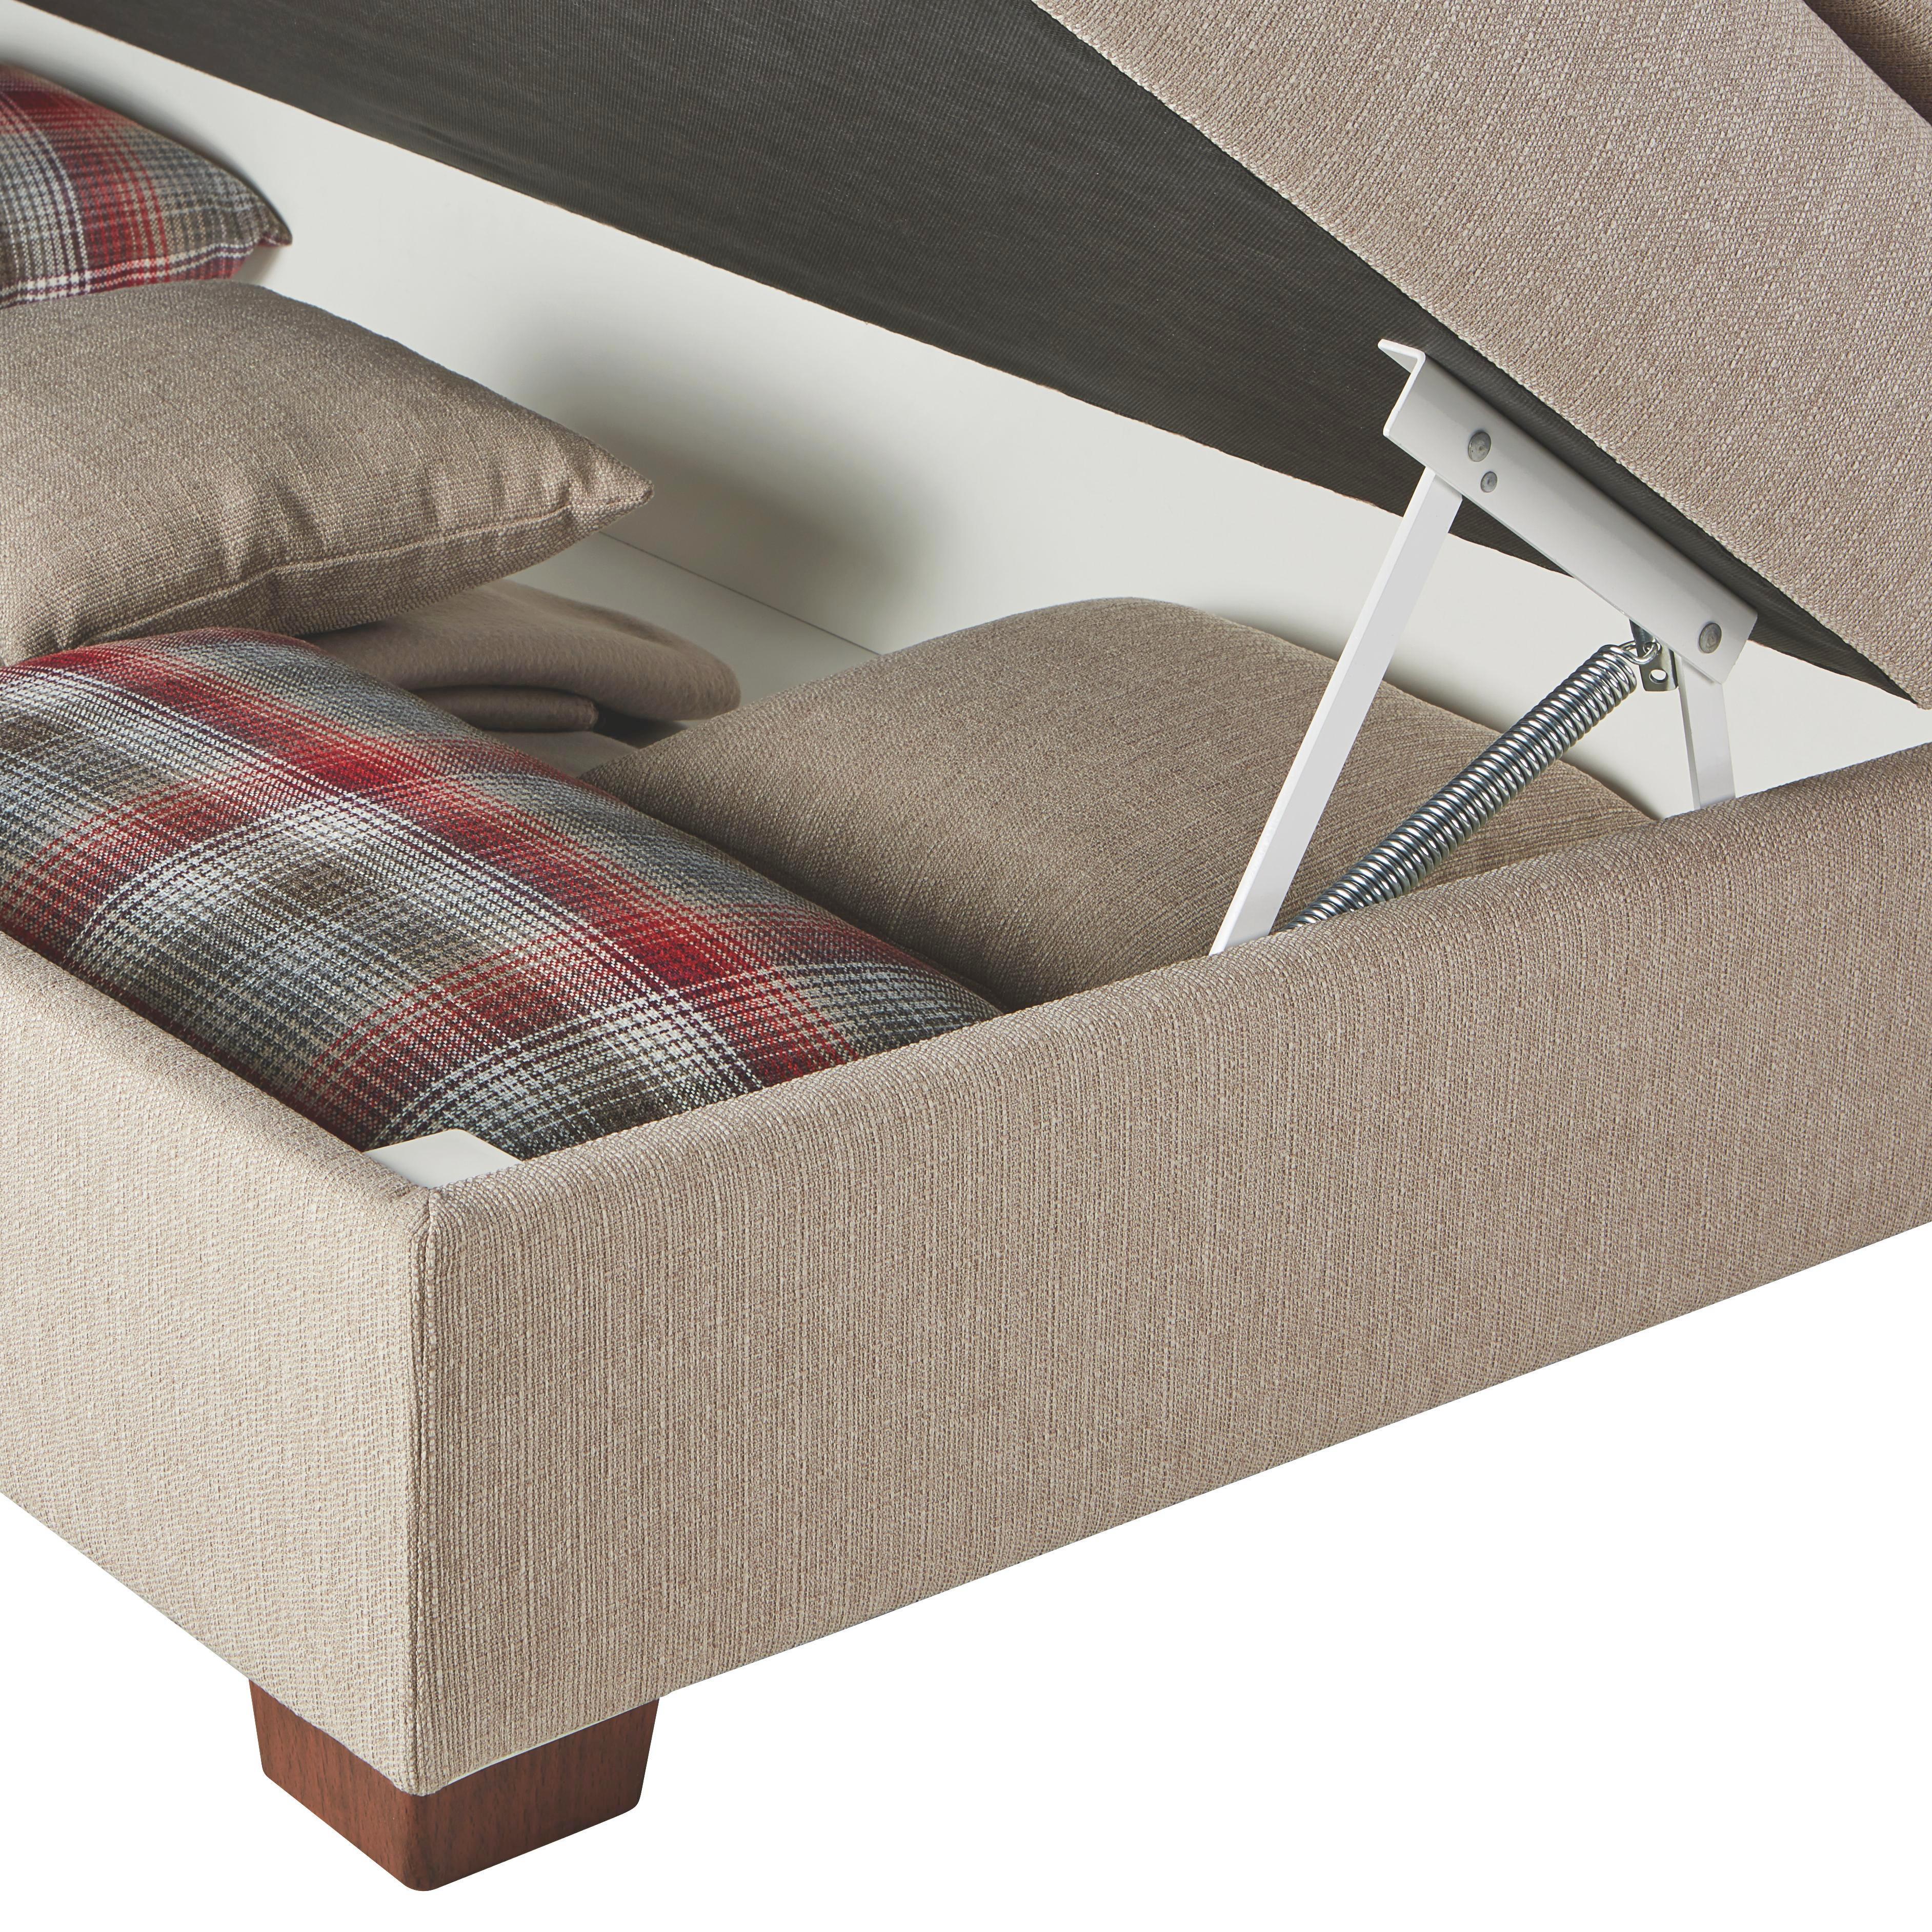 Boxspringbett in Creme, ca. 160x200cm - Nussbaumfarben, ROMANTIK / LANDHAUS, Holzwerkstoff/Kunststoff (223/173/118cm) - PREMIUM LIVING